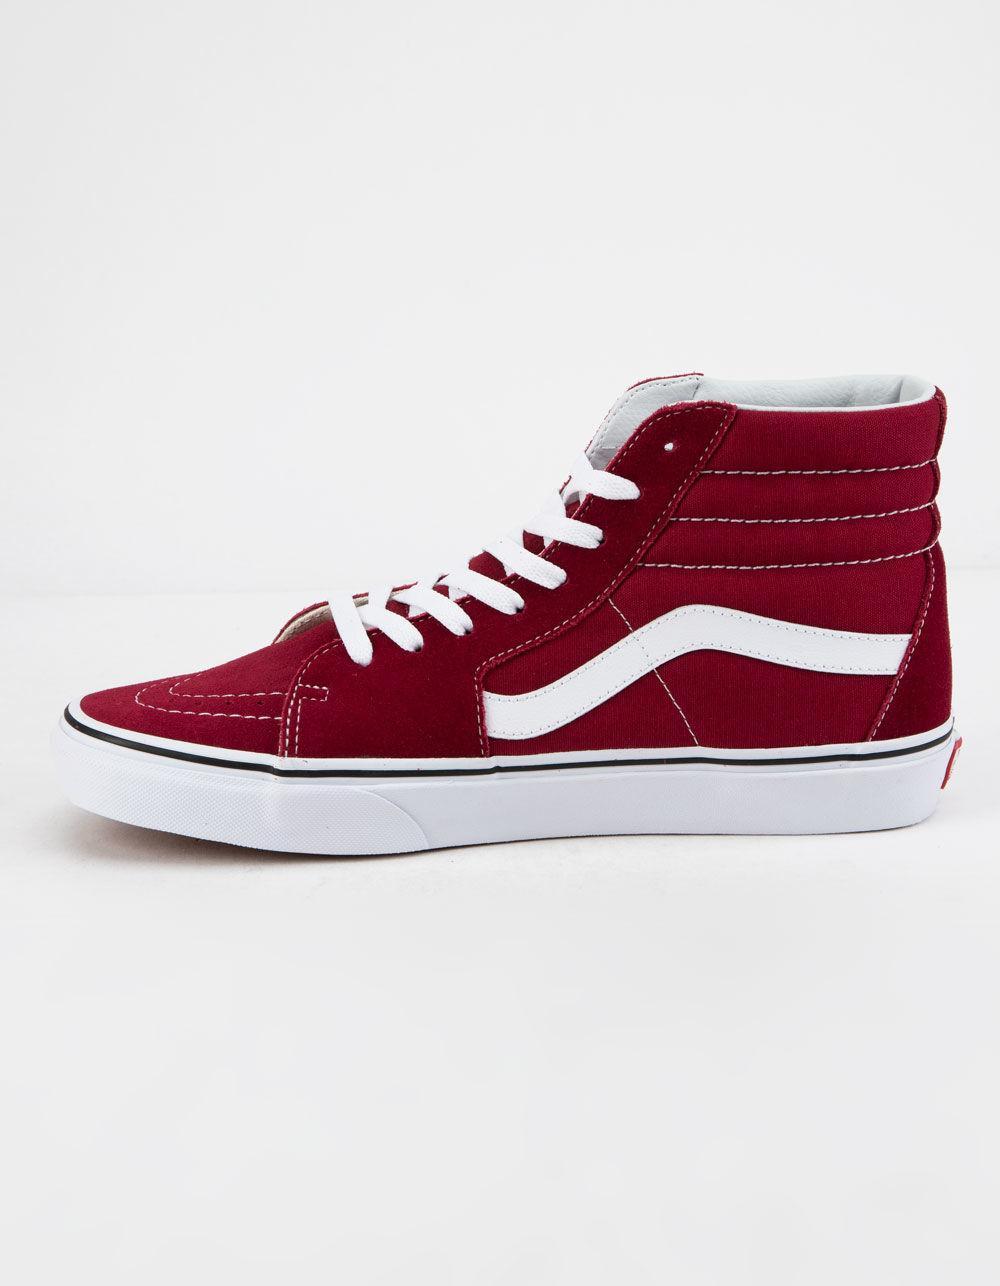 a757cda0018 Vans - Sk8-hi Rumba Red   True White Shoes - Lyst. View fullscreen